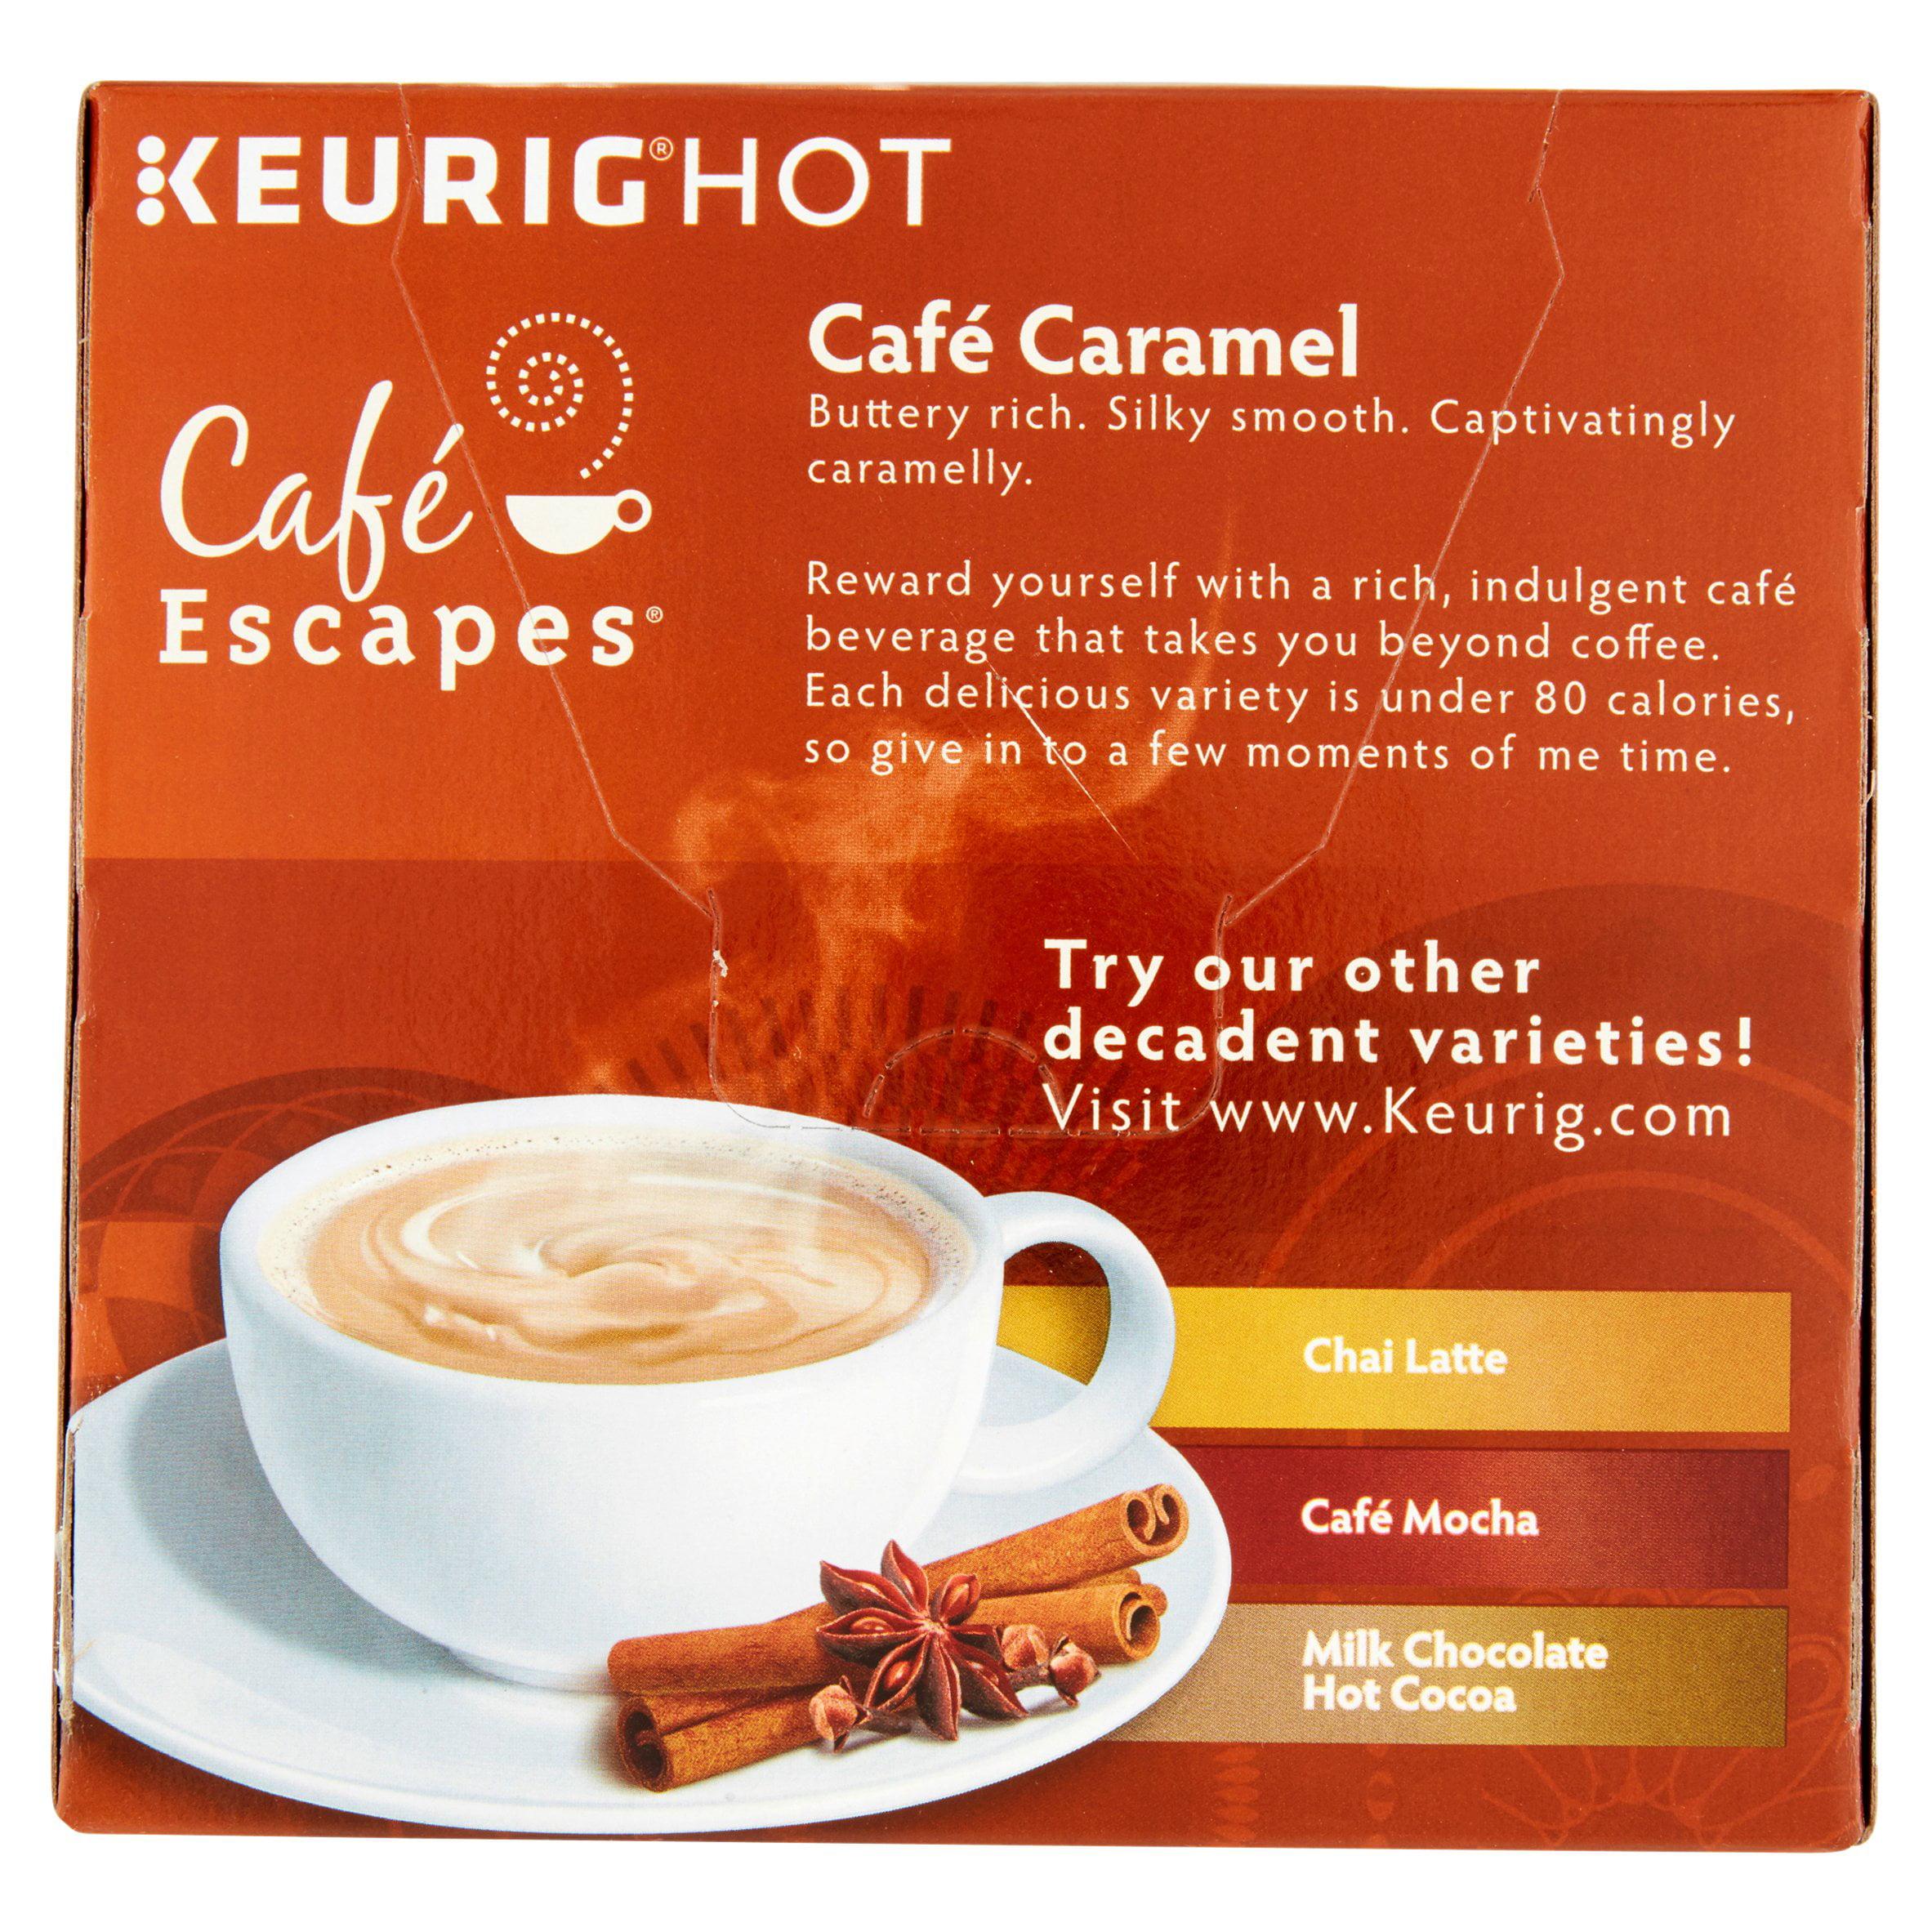 Keurig Hot Chocolate Calories - Pumpkin Chocolate Chip Cookies